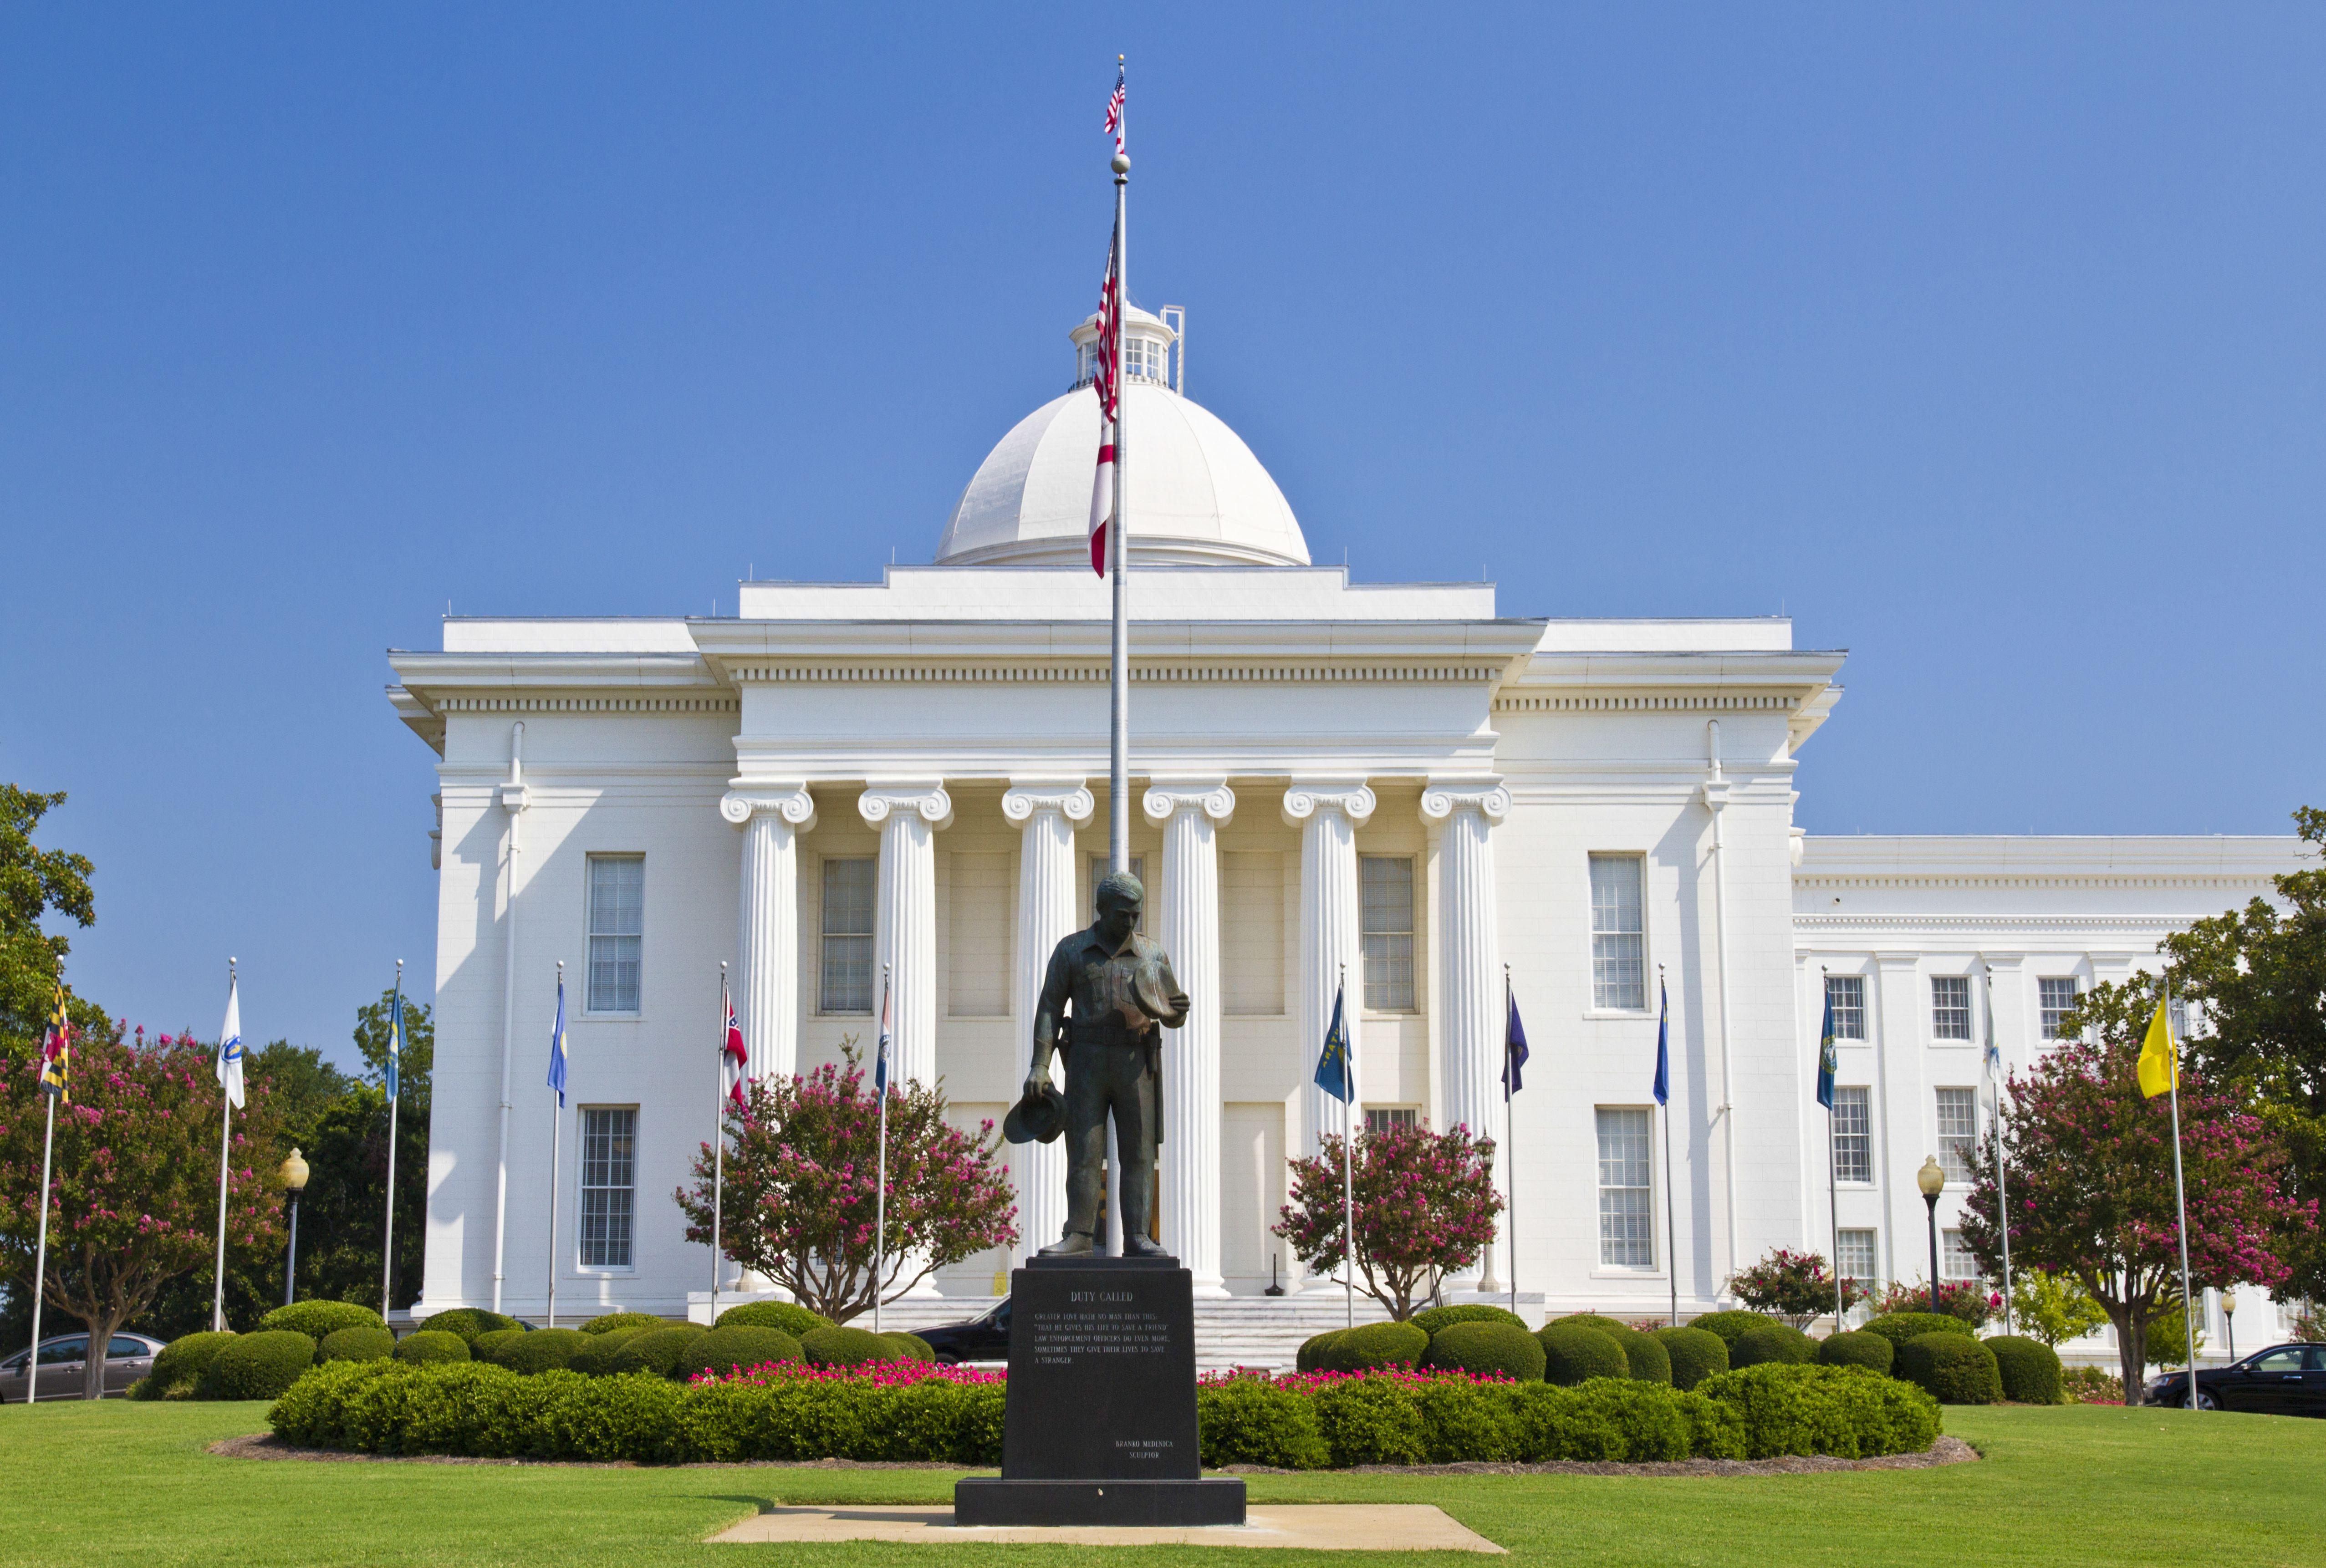 Alabama state capitol building